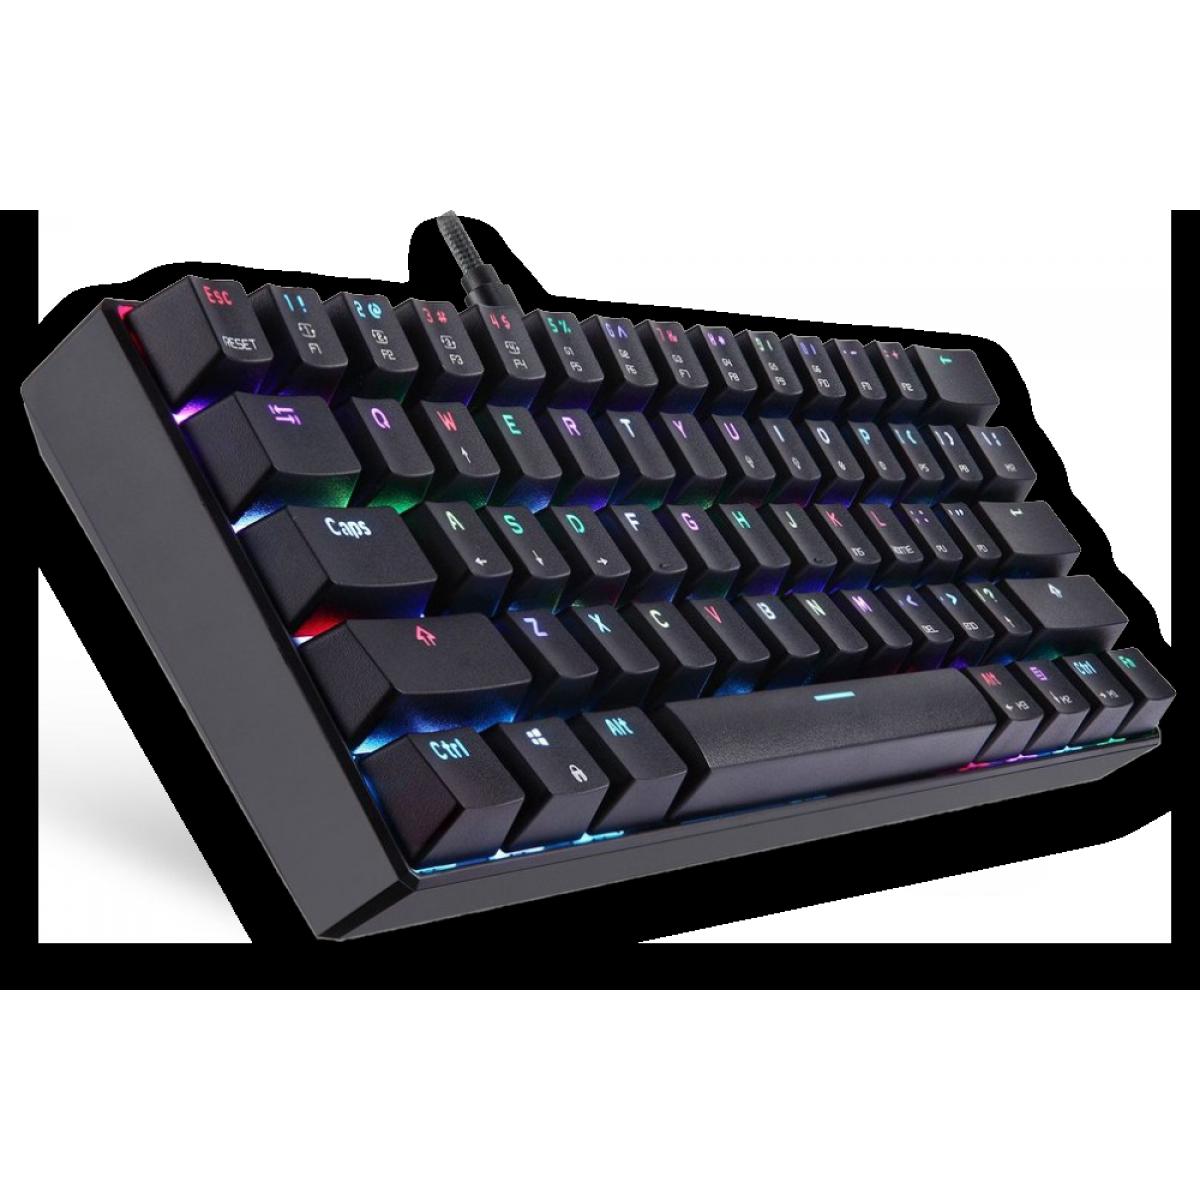 Teclado Mecânico Gamer Motospeed CK61 Essential, RGB, Switch Azul, Preto, FMSTC0090AZL